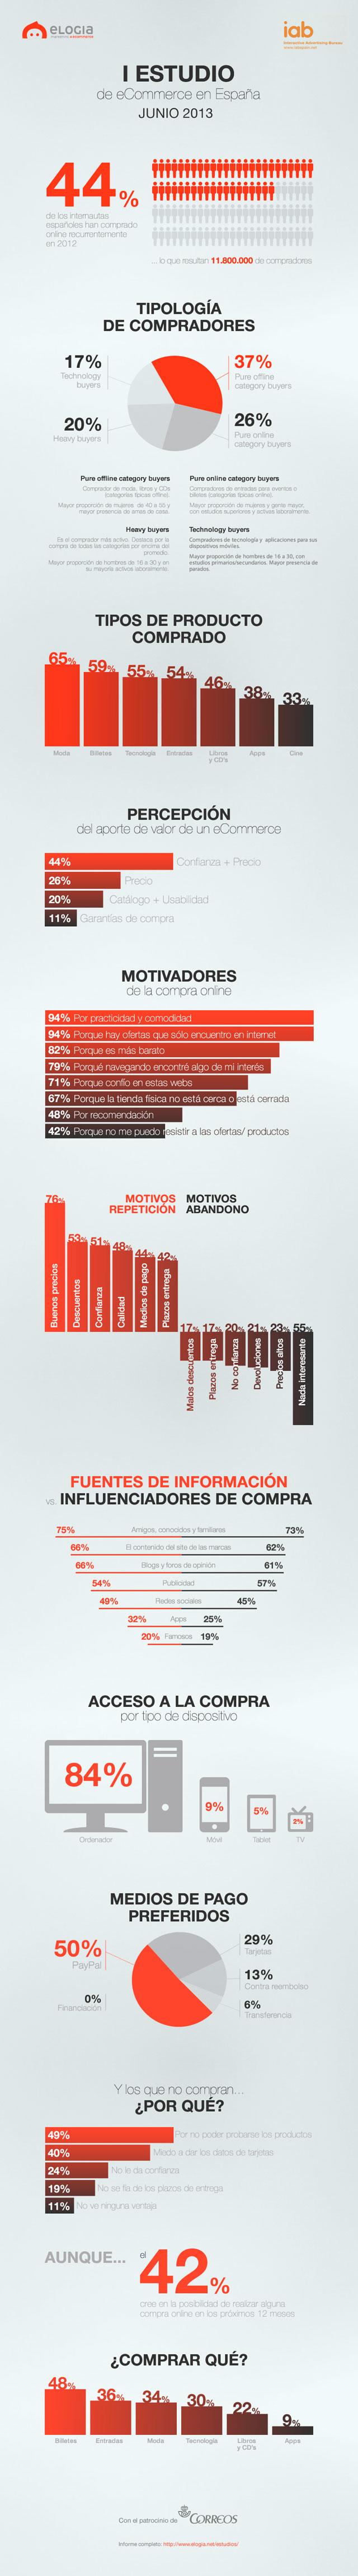 Infografico_IABEcommerce_Elogia